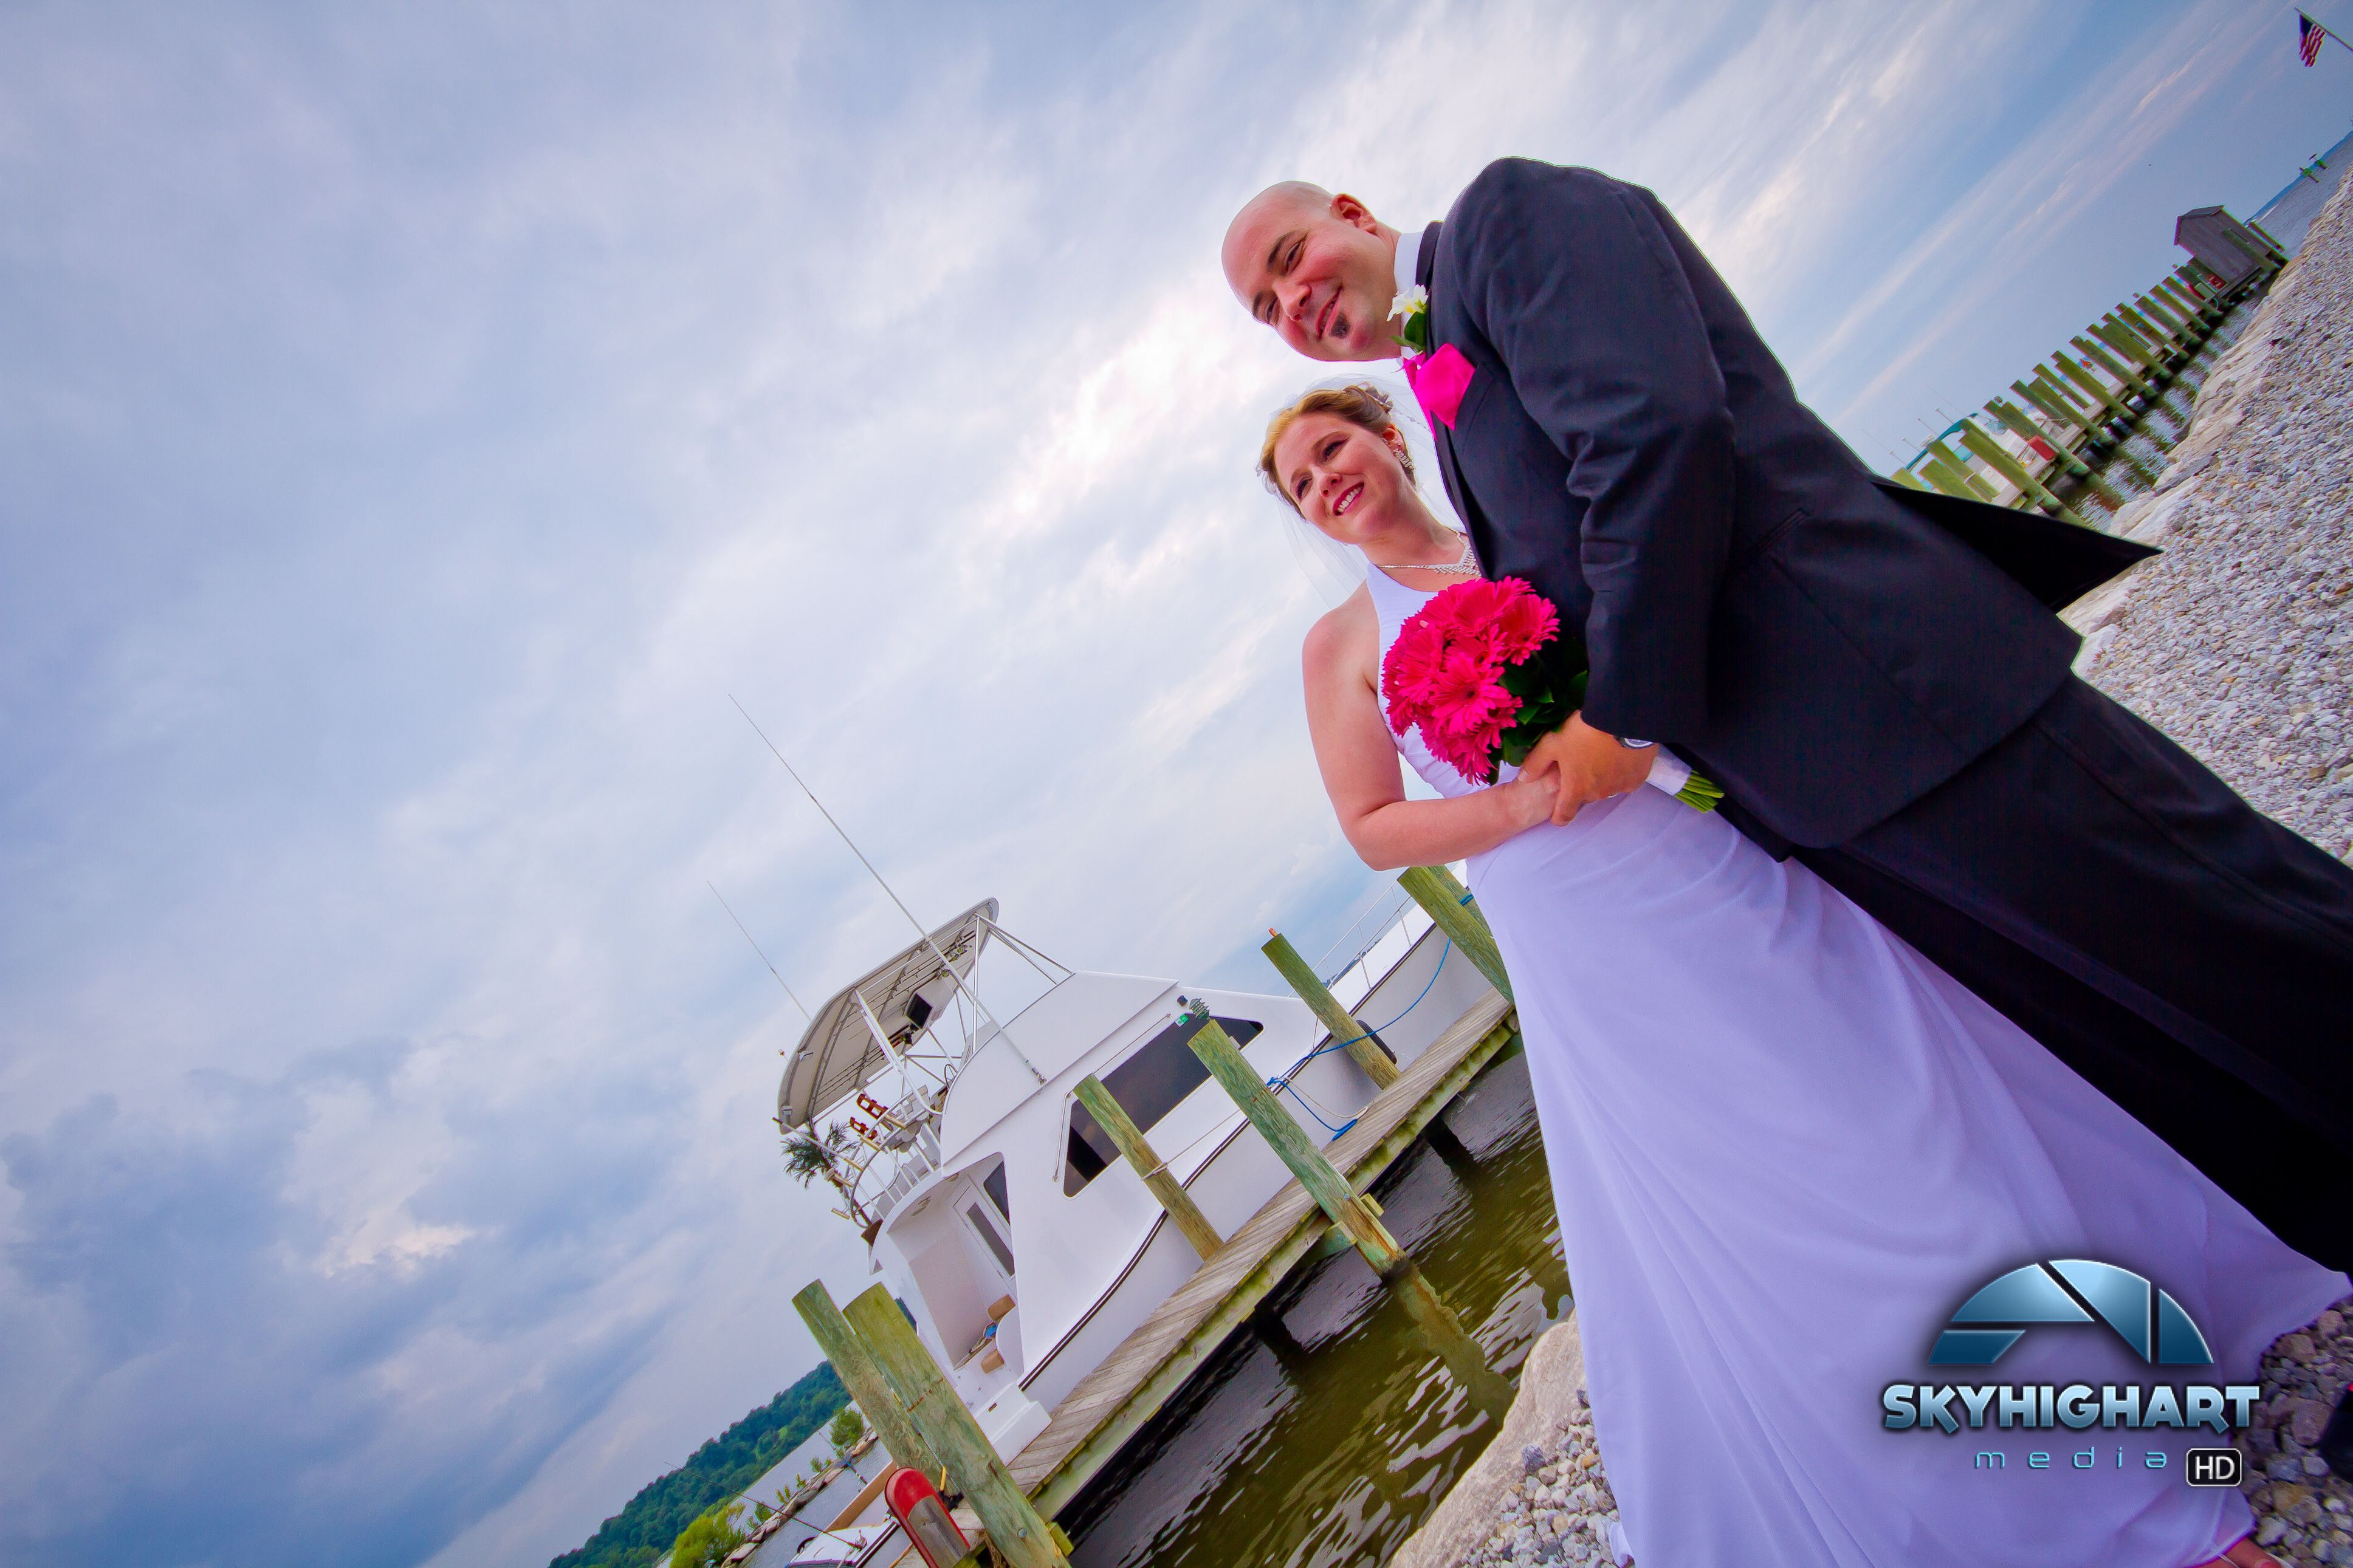 Peter Stepanek Photography Vintage & Weddings  Original Classy Look 2014 skyhighart.com